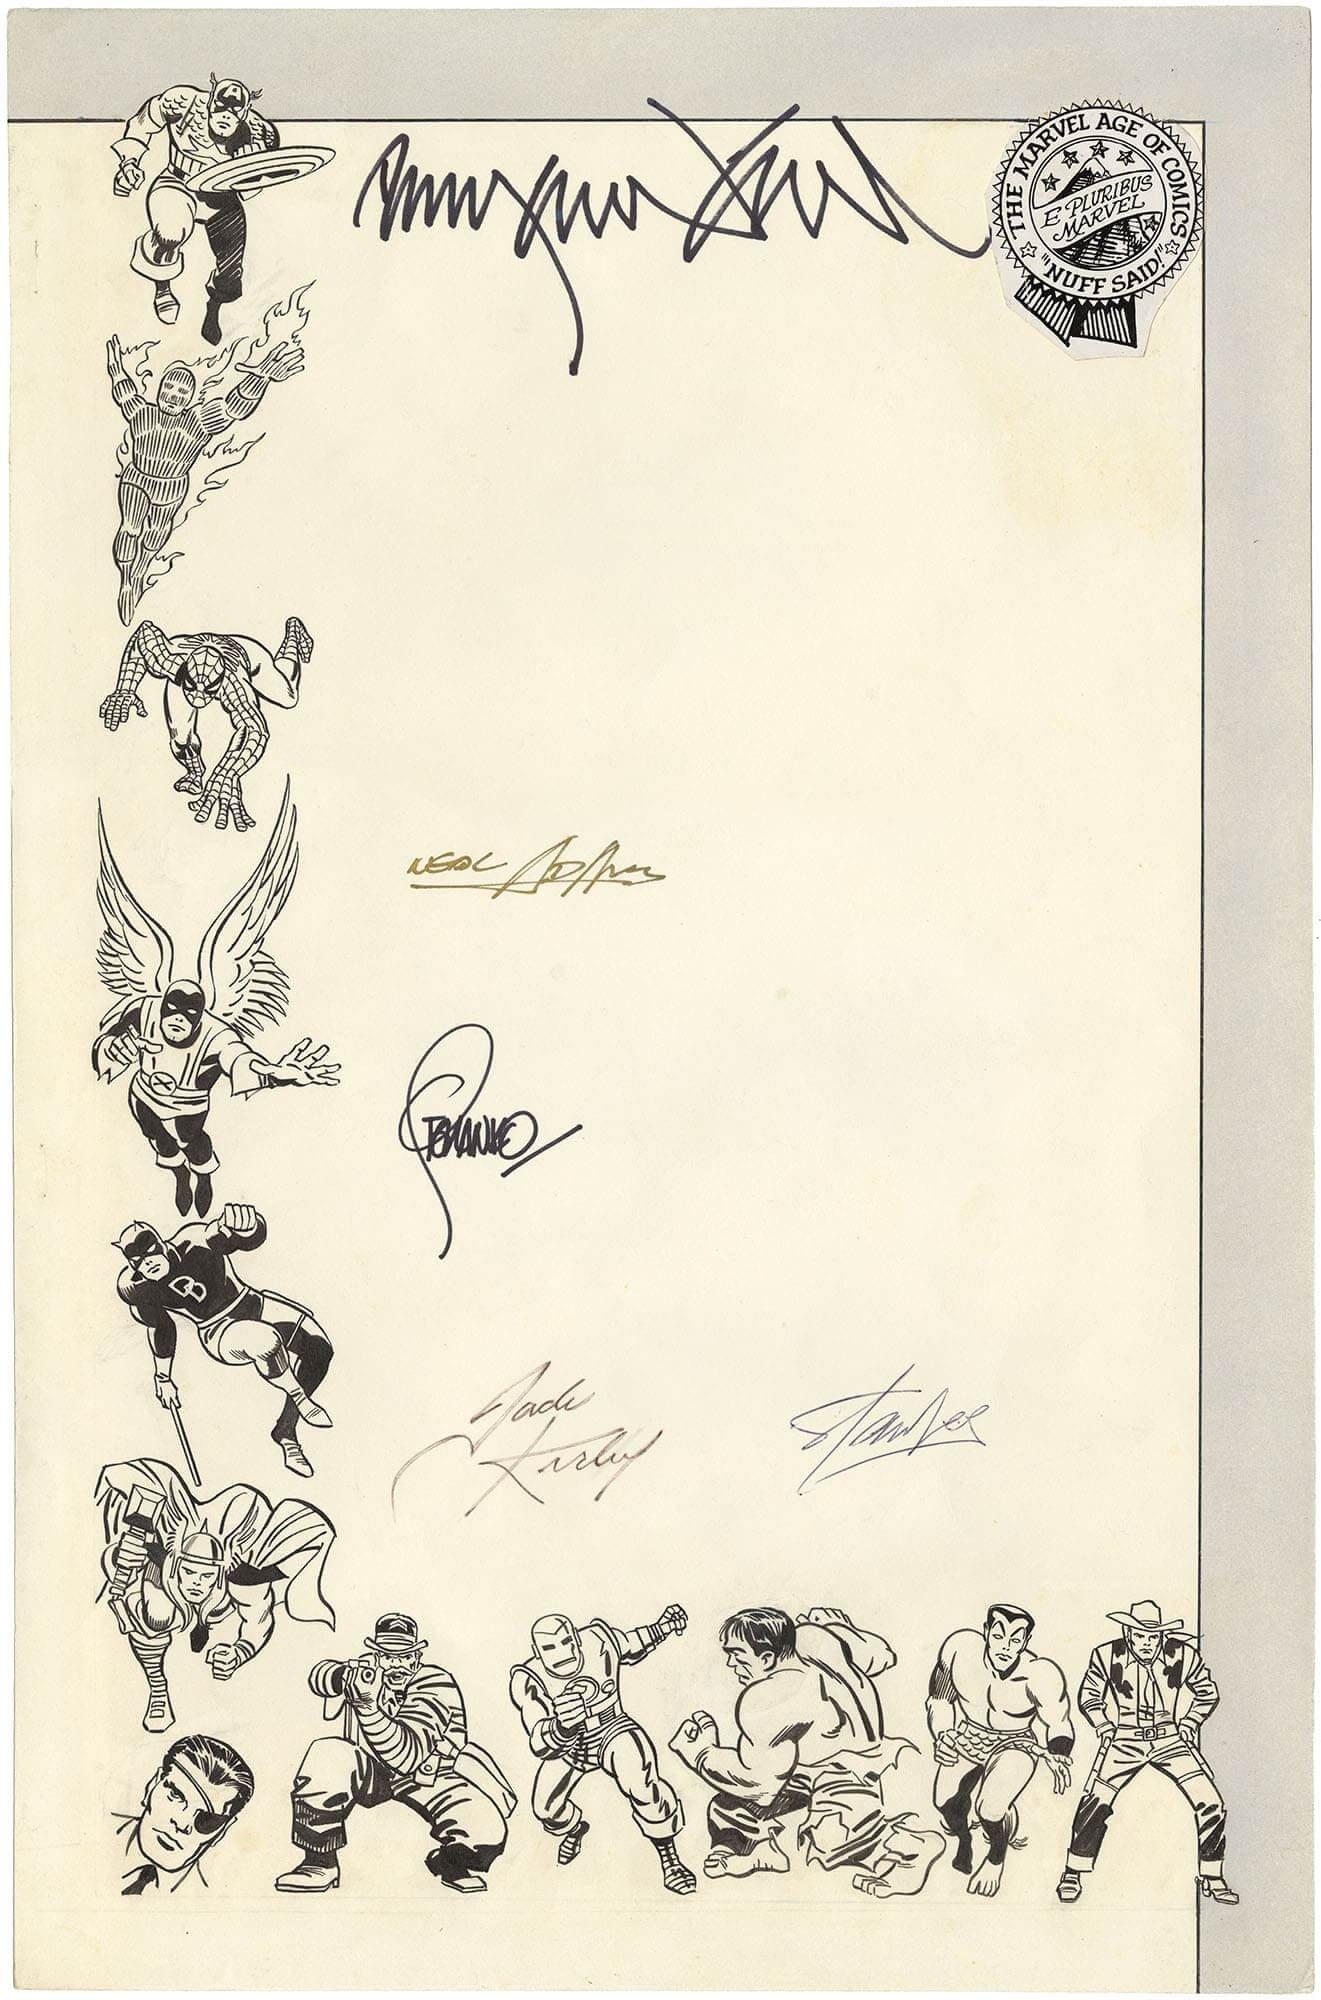 Merry Marvel Marching Society Letterhead - (5 Key Signatures)